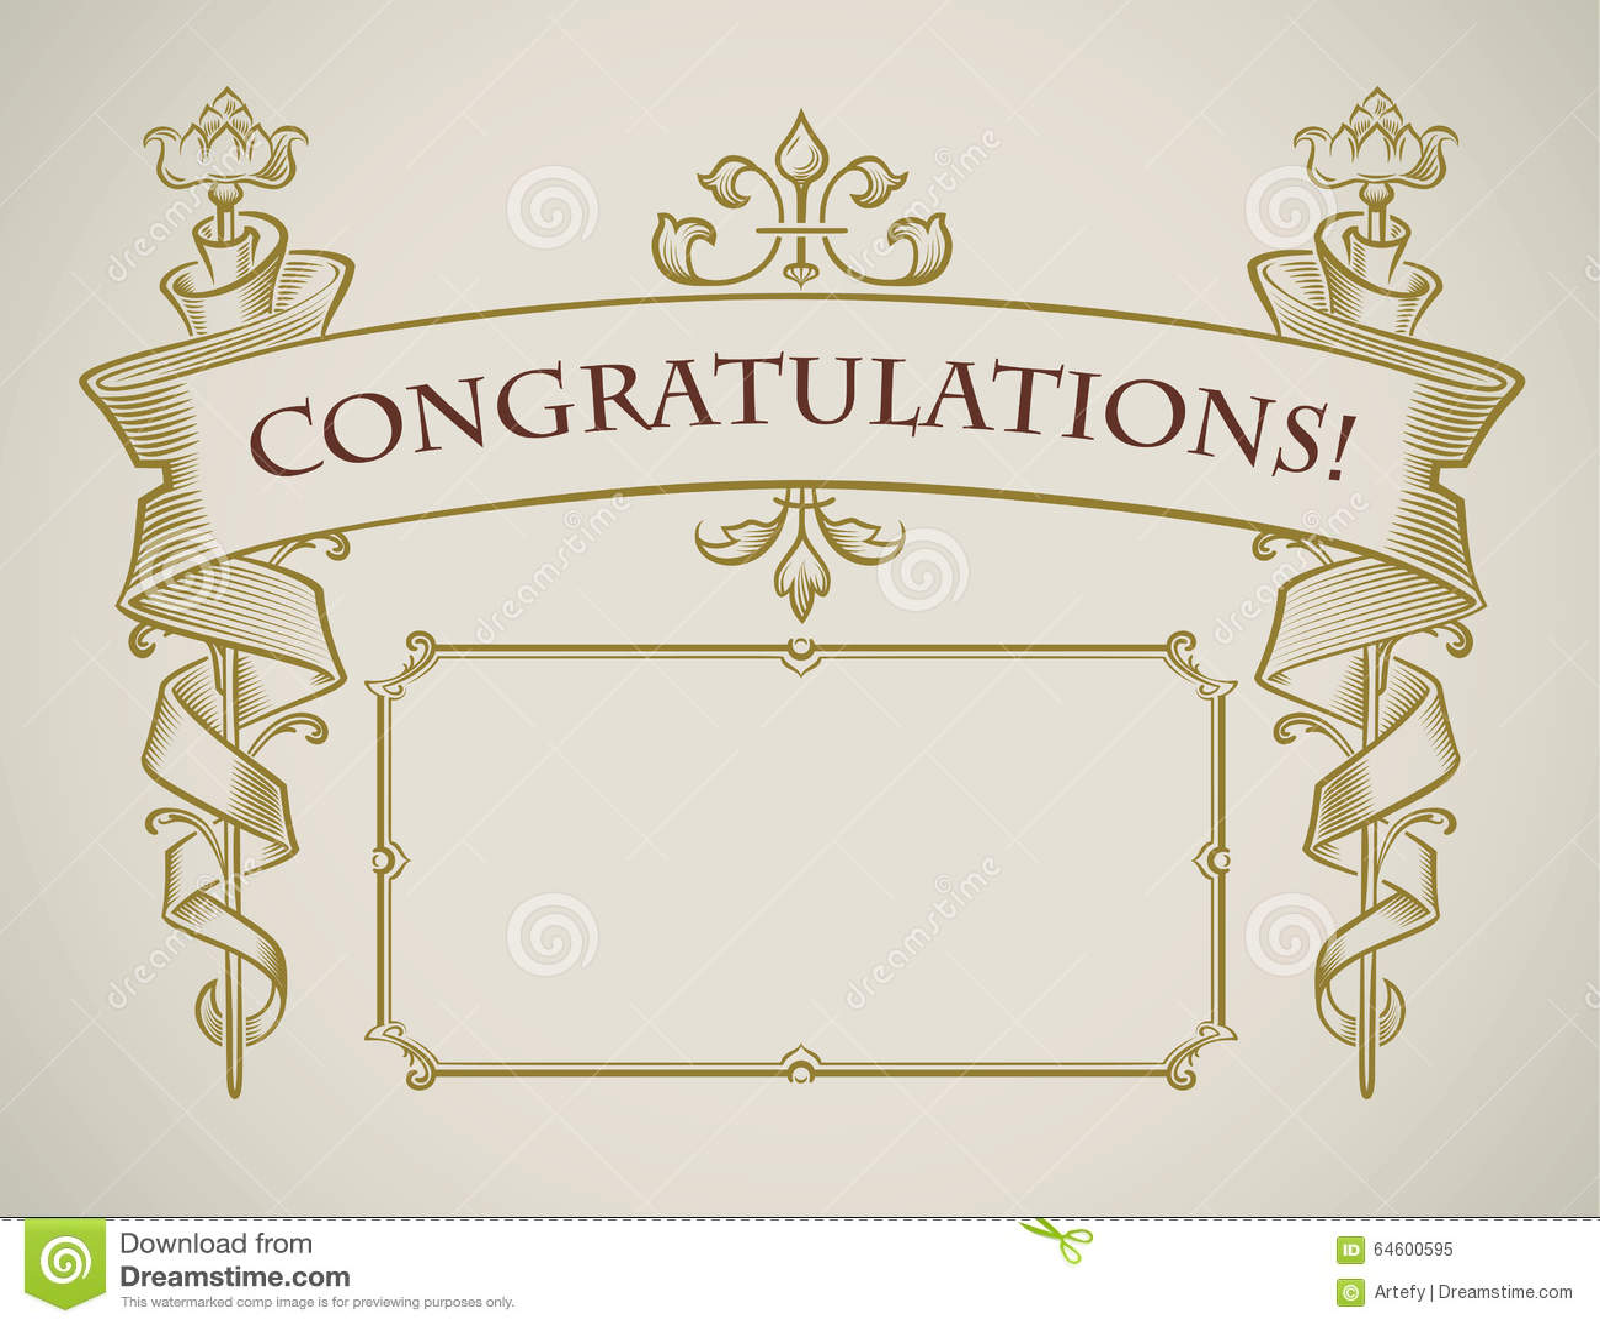 Vintage Style Congratulation Card Stock Vector - Image ...